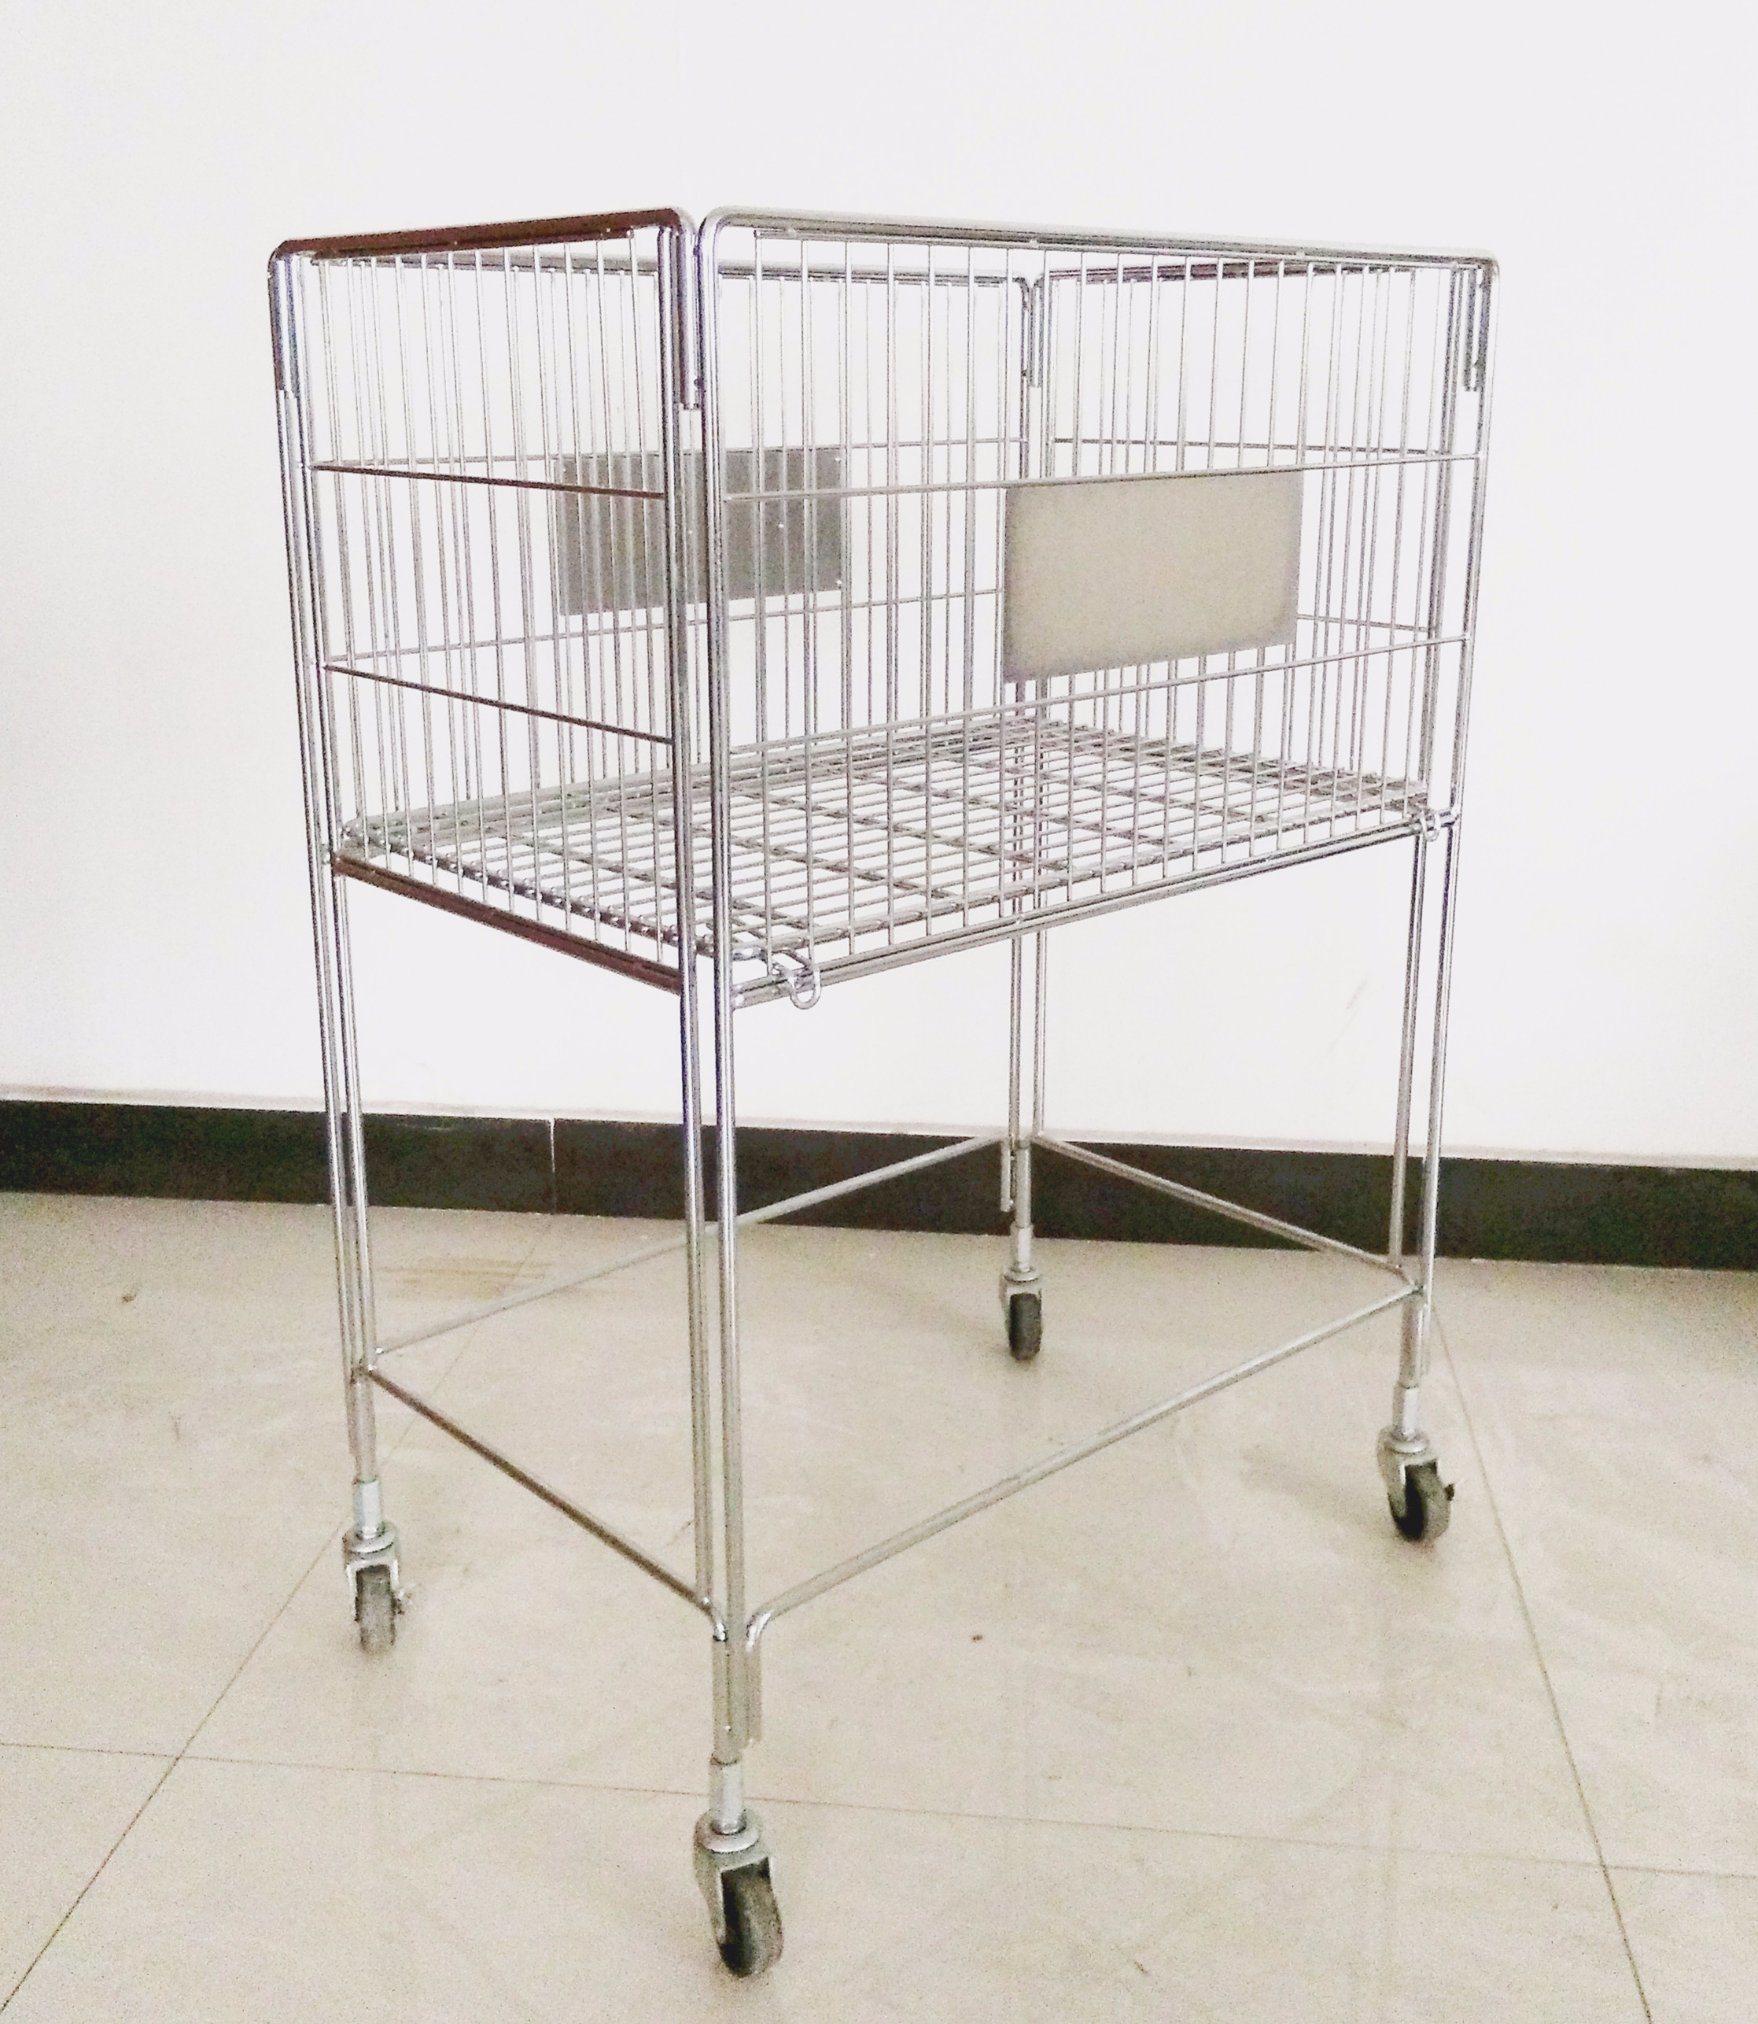 Supermarket Trolley, Shopping Cart, Customized